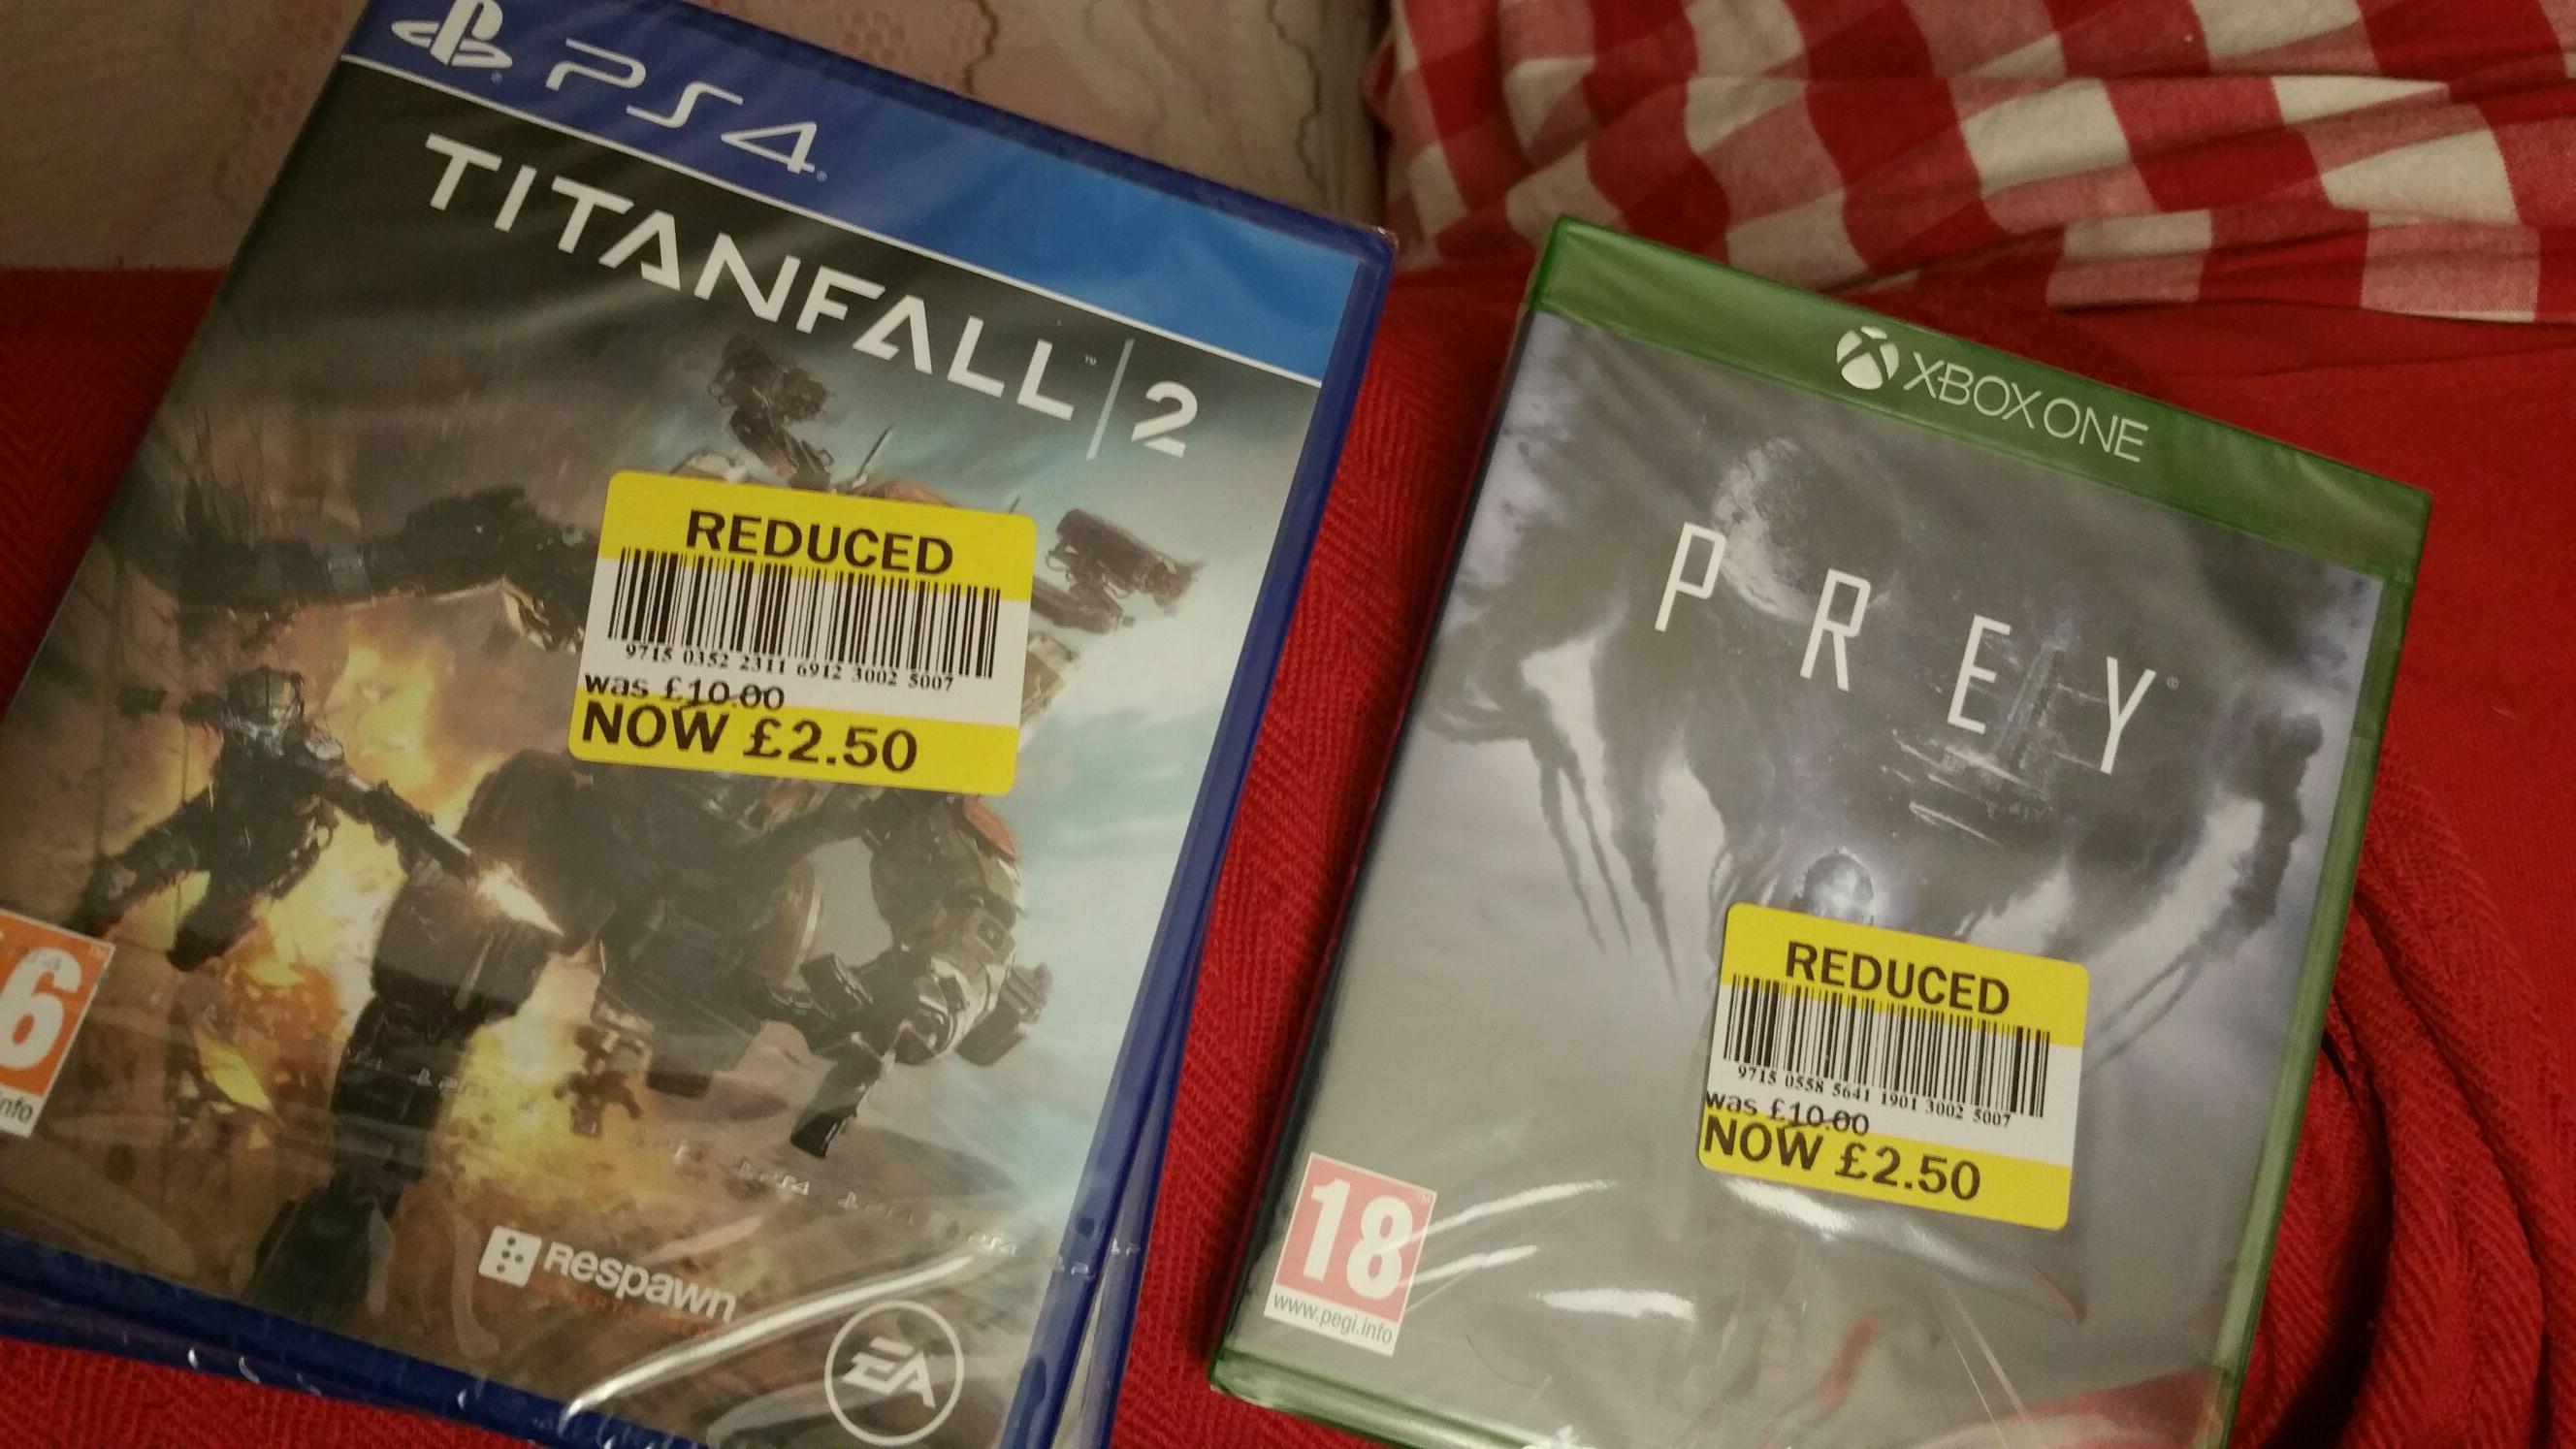 Titan fall 2 ps4 £2.50 and Prey XB1 £2.50 instore @ Tesco